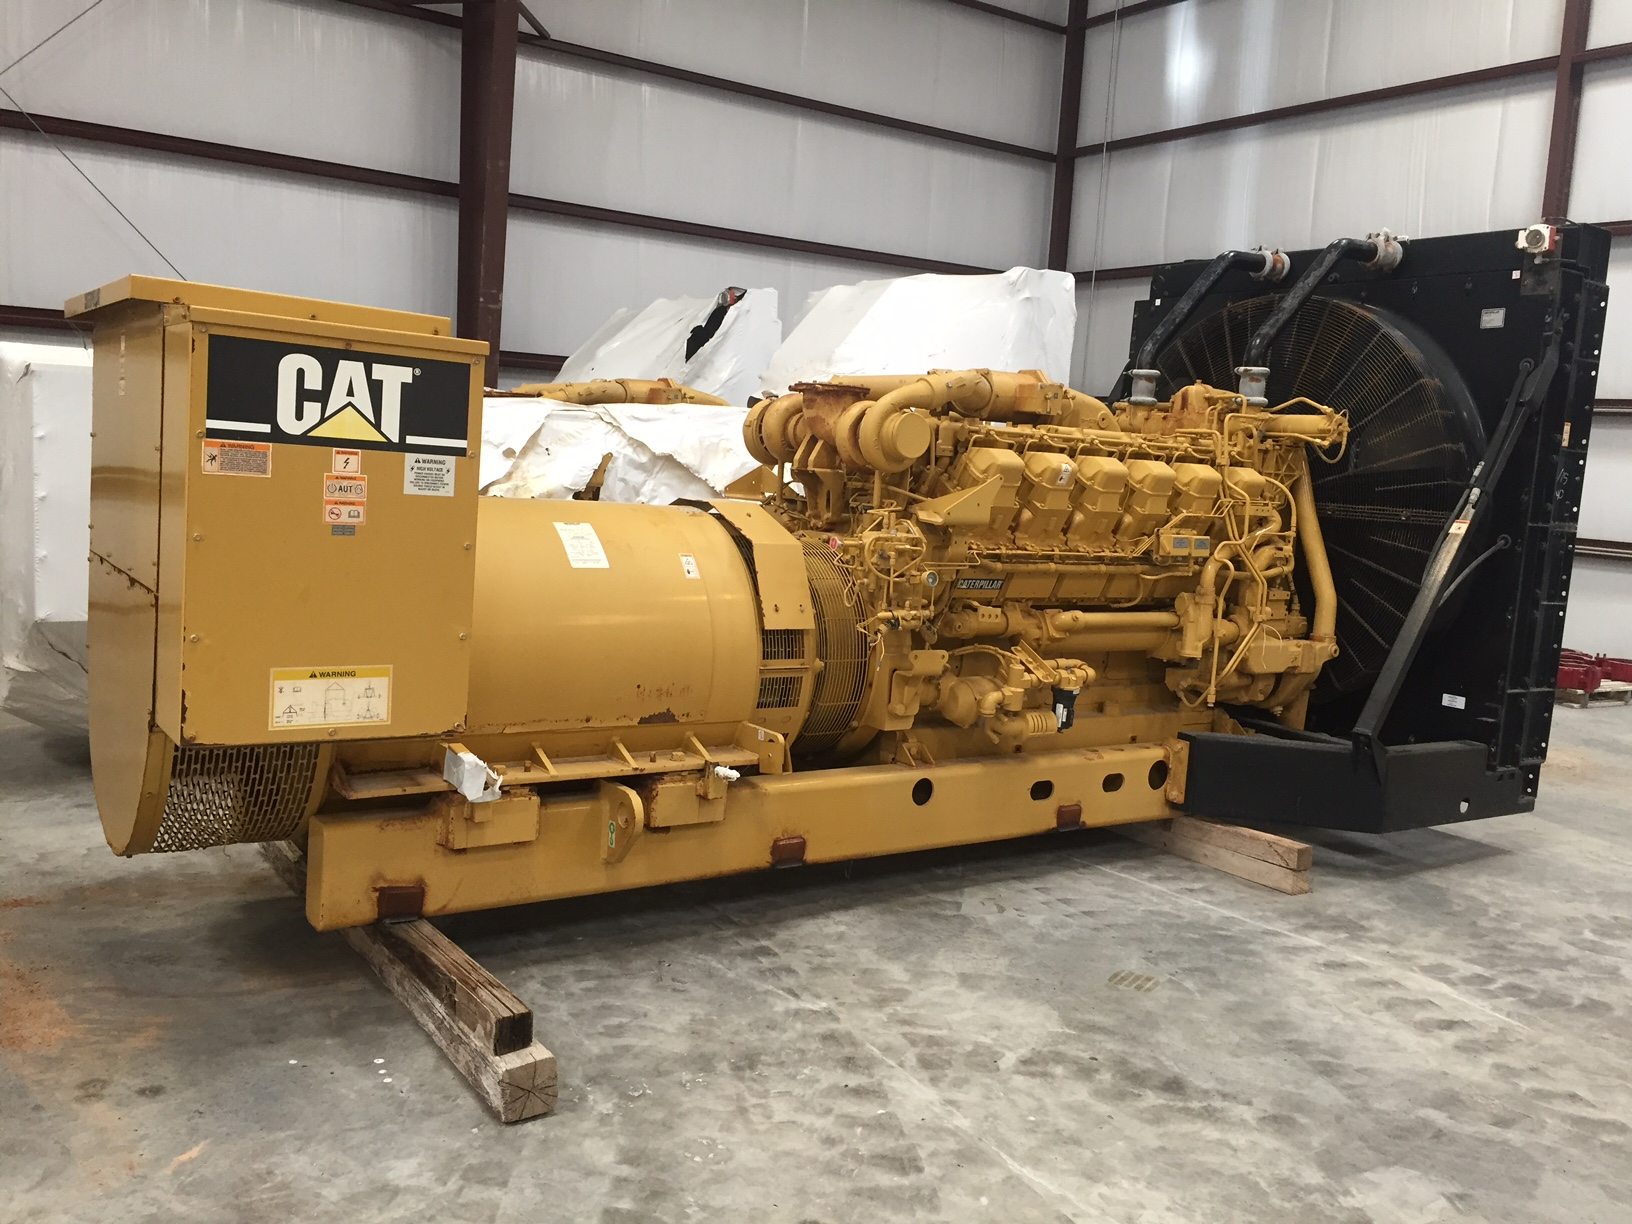 Caterpillar 3512 Mui Engine Sr4 Generator Set With